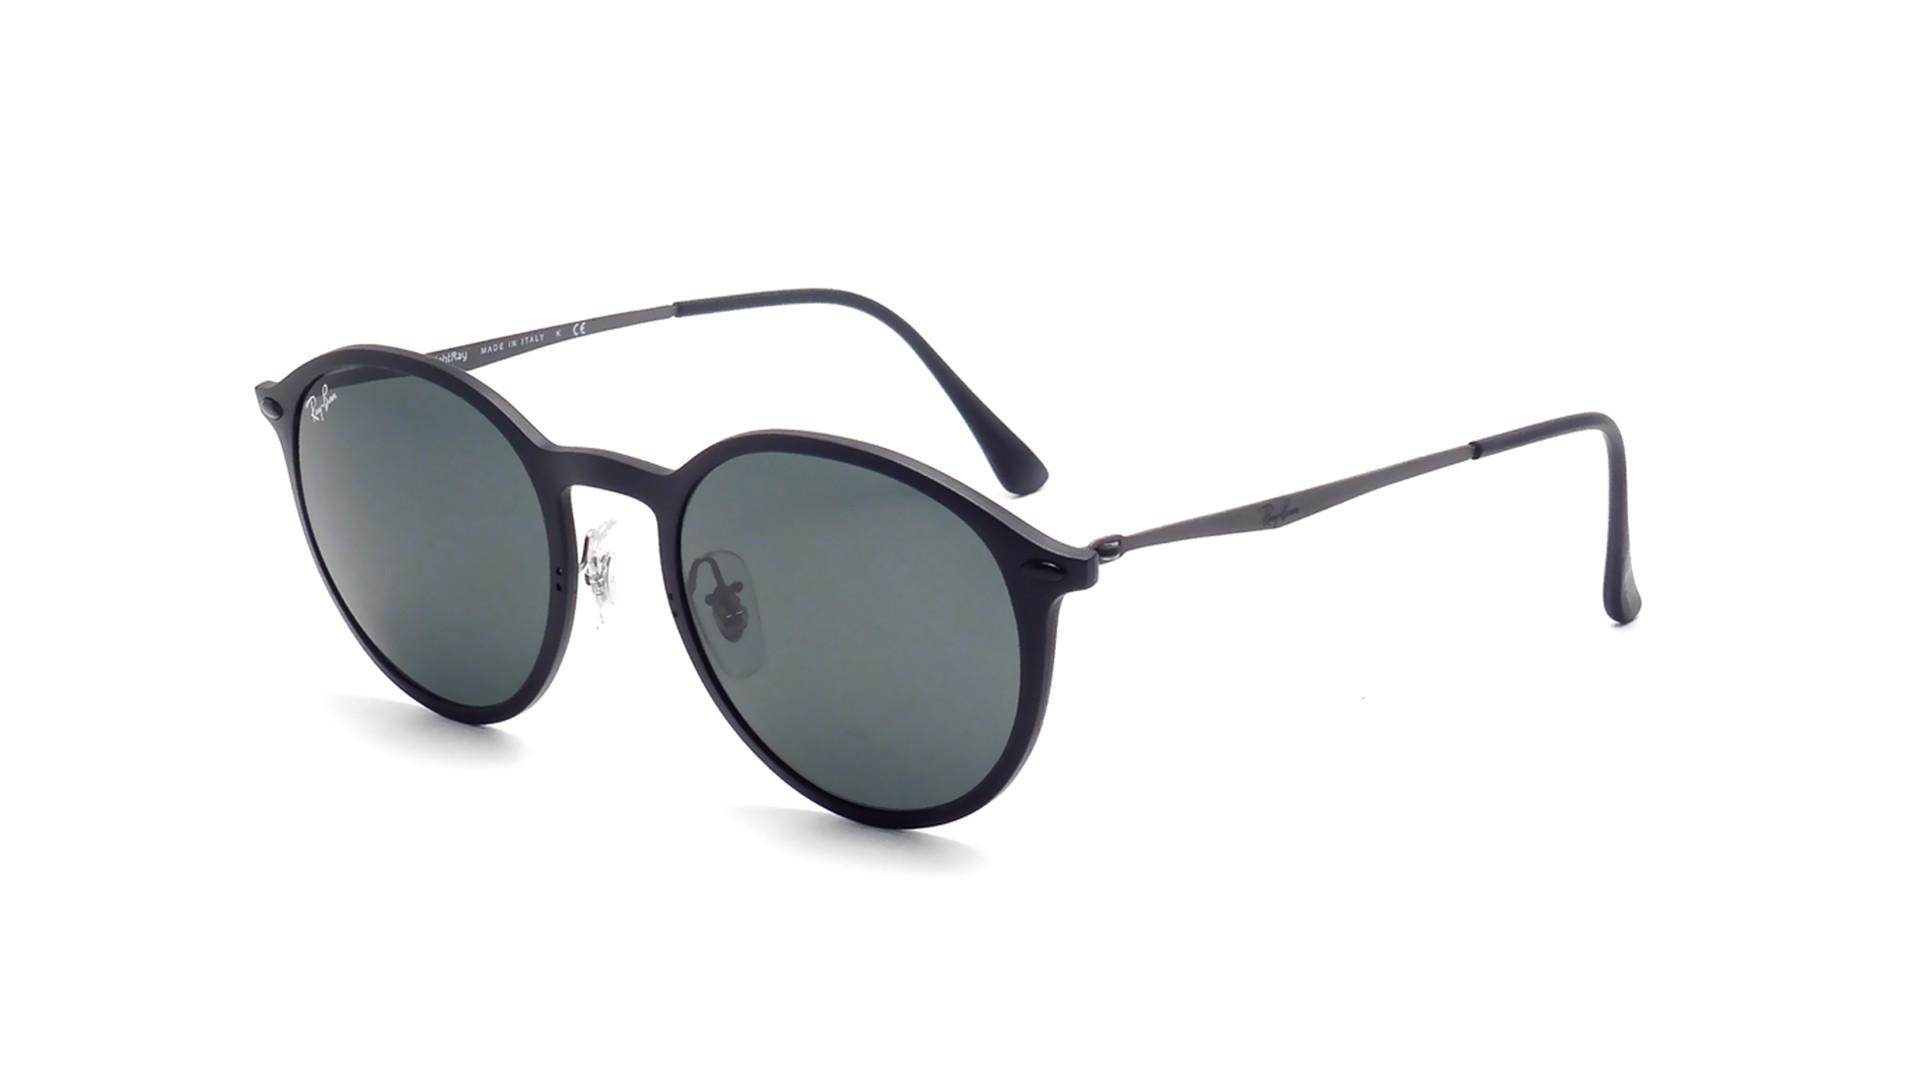 5d3aacb7c38b7 reduced sunglasses ray ban round light ray black rb4224 601s71 49 20 medium  1c858 bb726